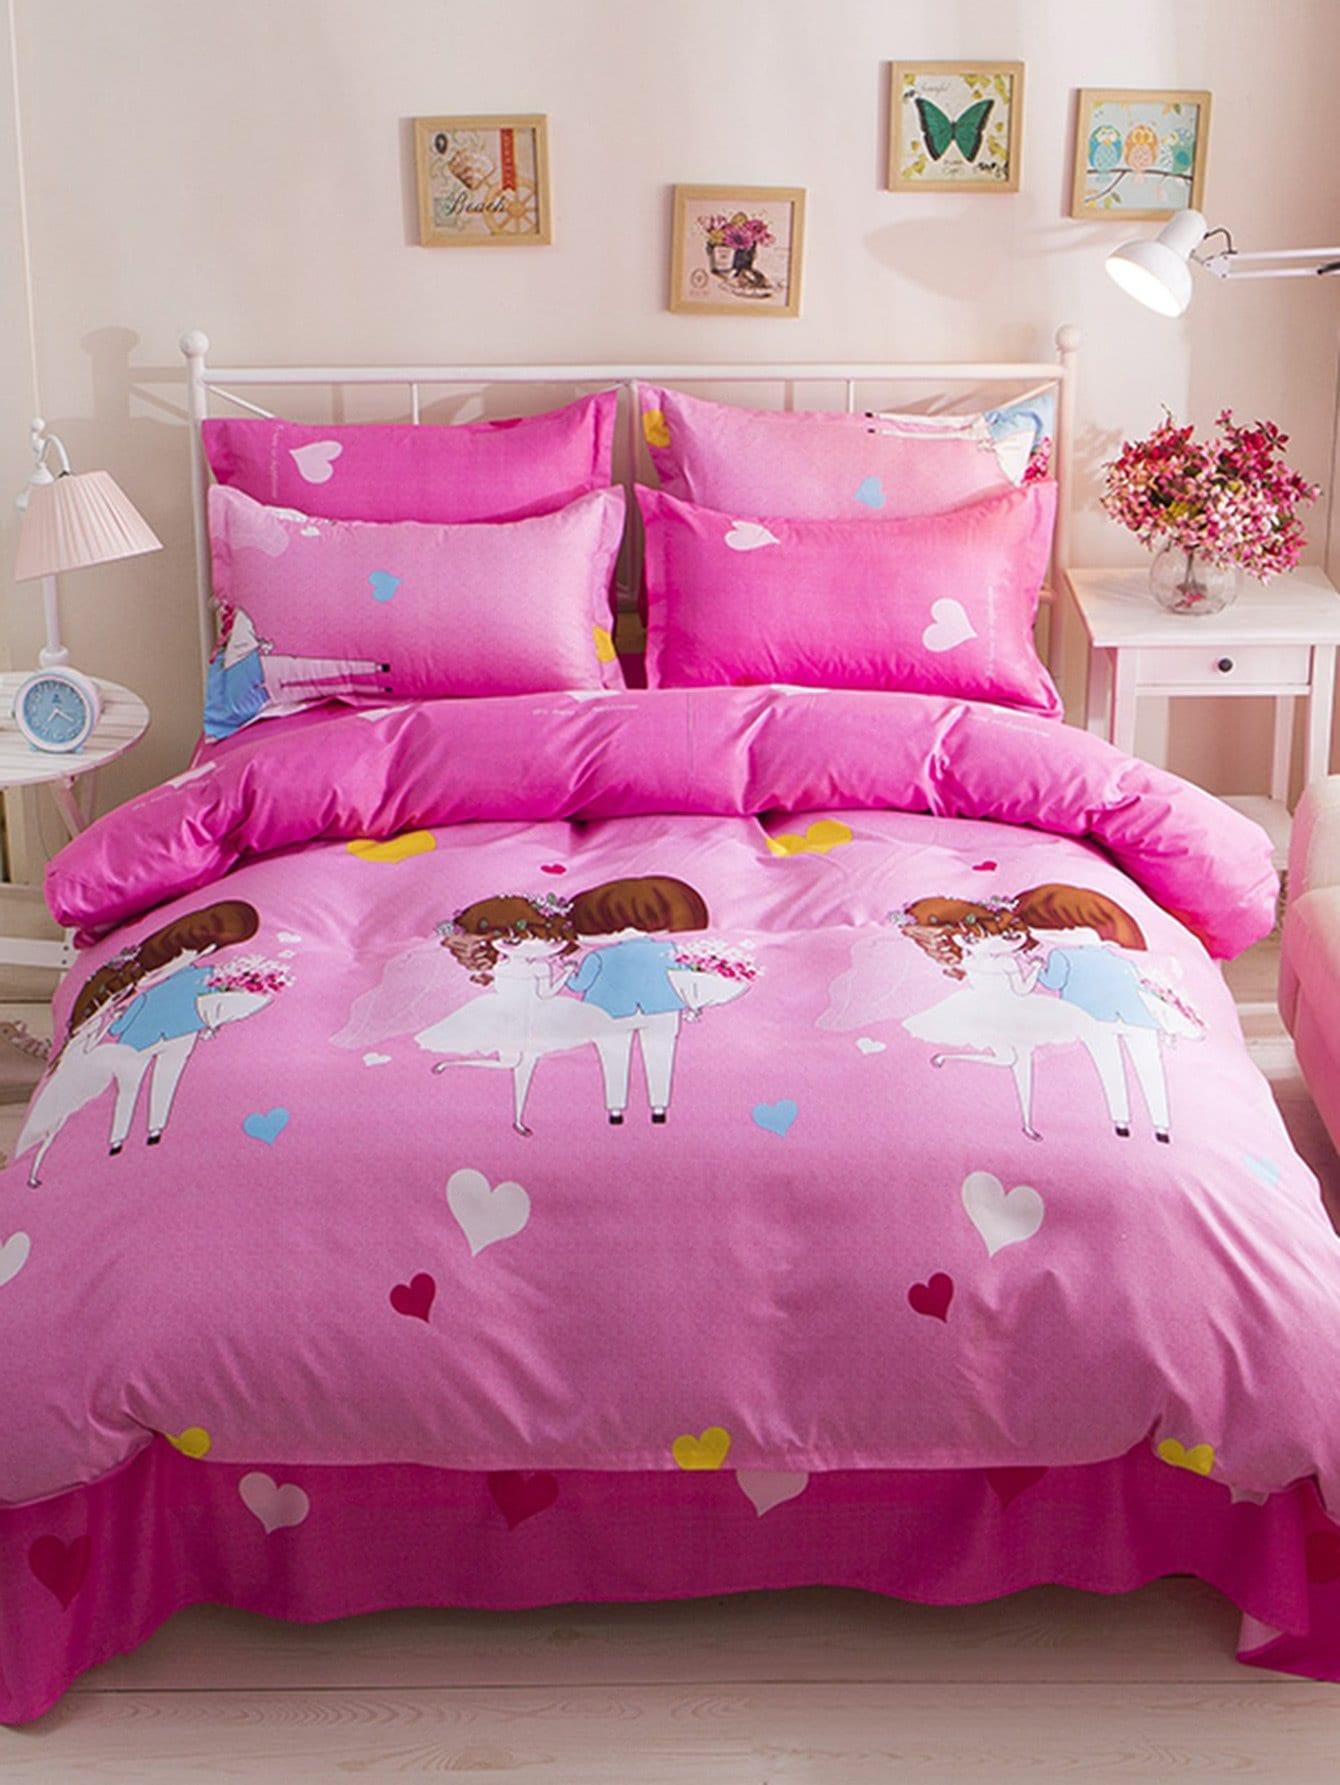 Figure & Heart Print Bedding Set heart print bedding set